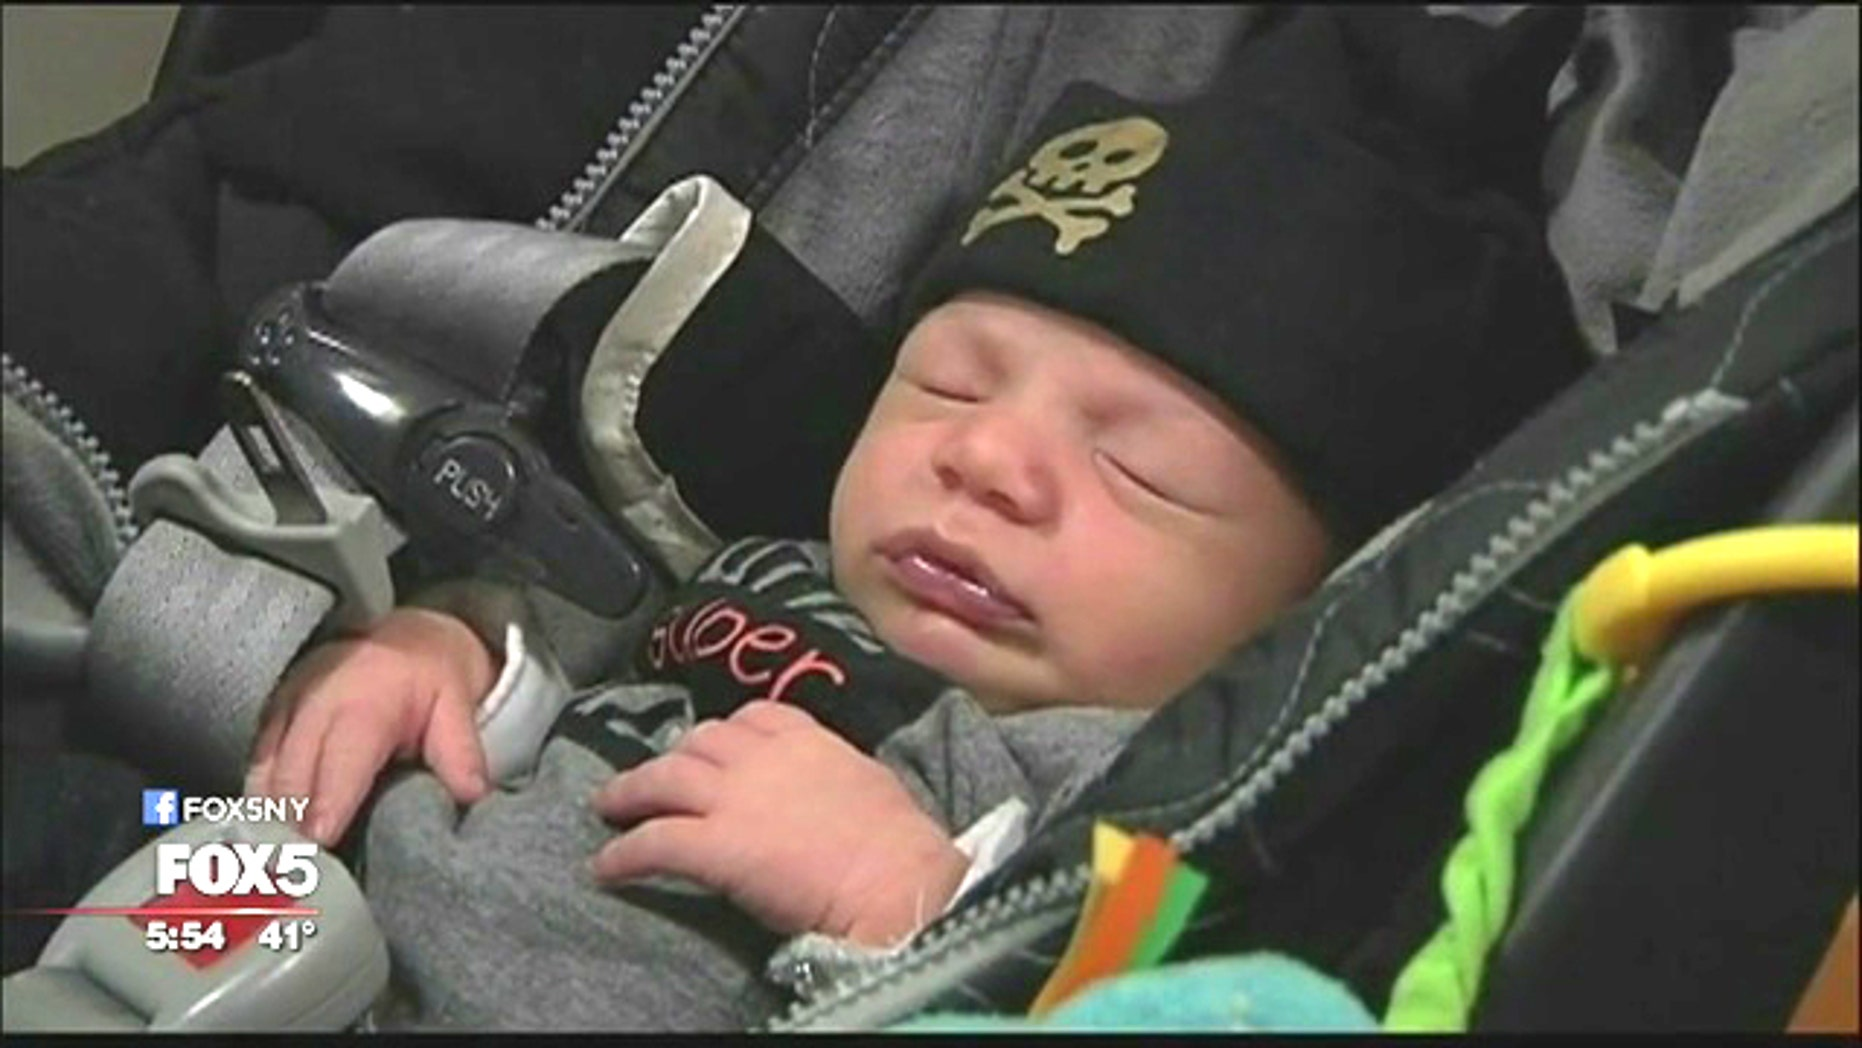 Dylan Tepfer was delivered by the same doctor who delivered his parents.